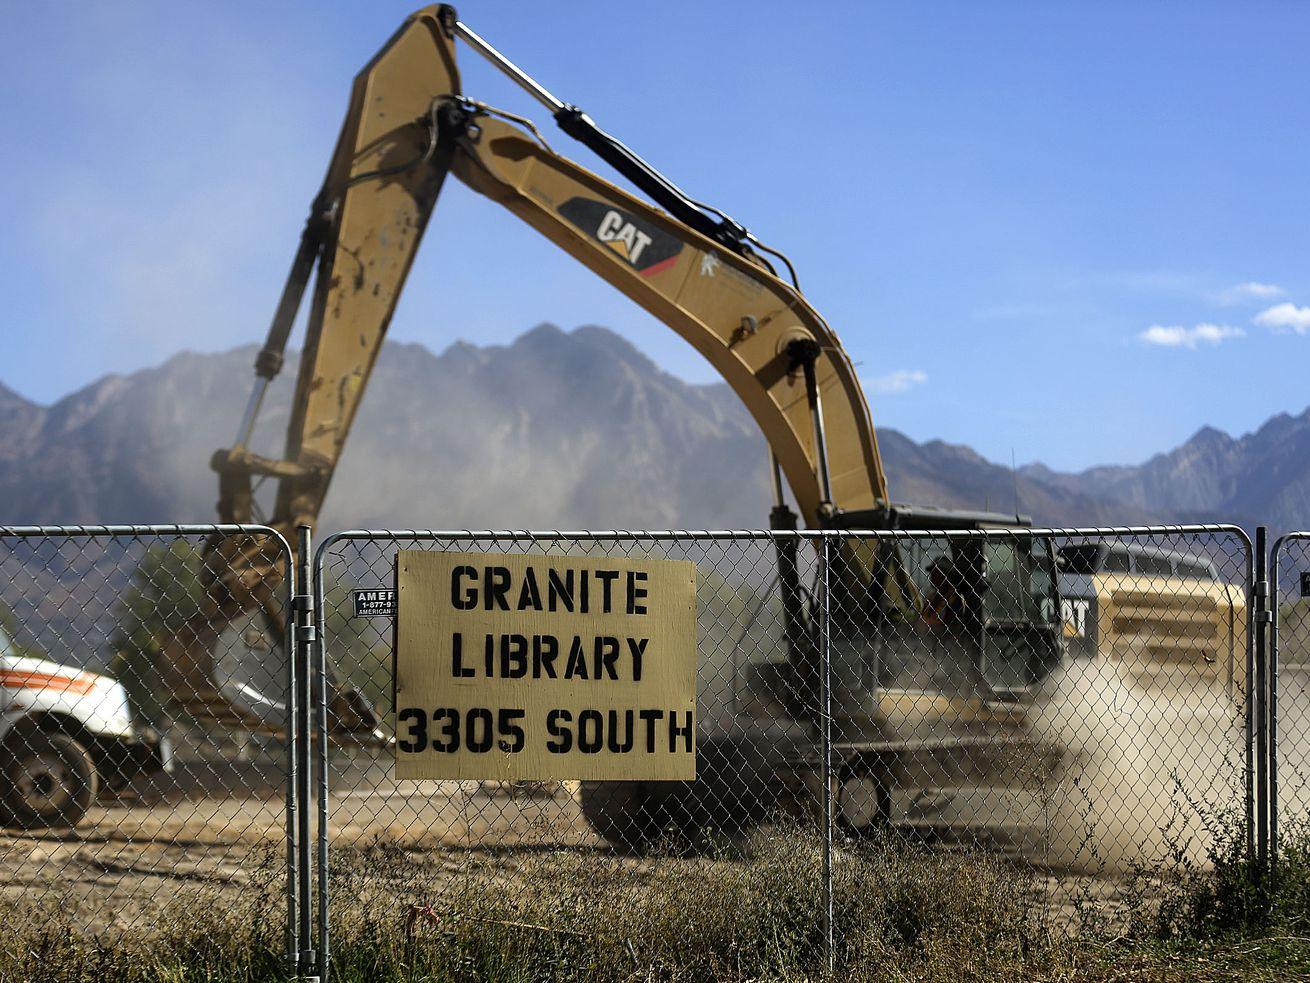 Salt Lake County mayor proposes balanced 2021 budget in midst of 'brutal' pandemic